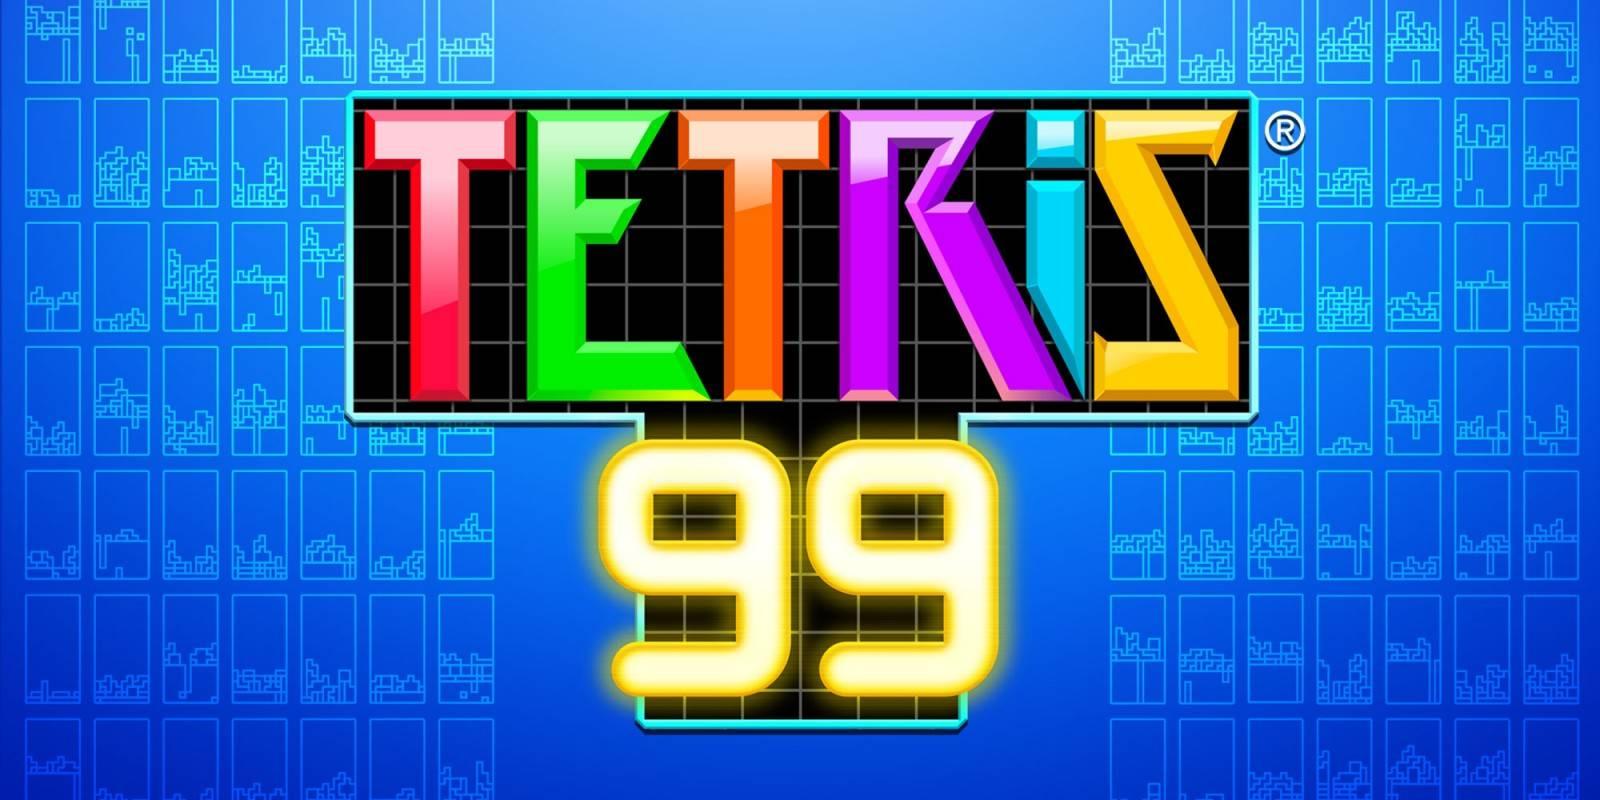 Tetris Salud Ansiedad